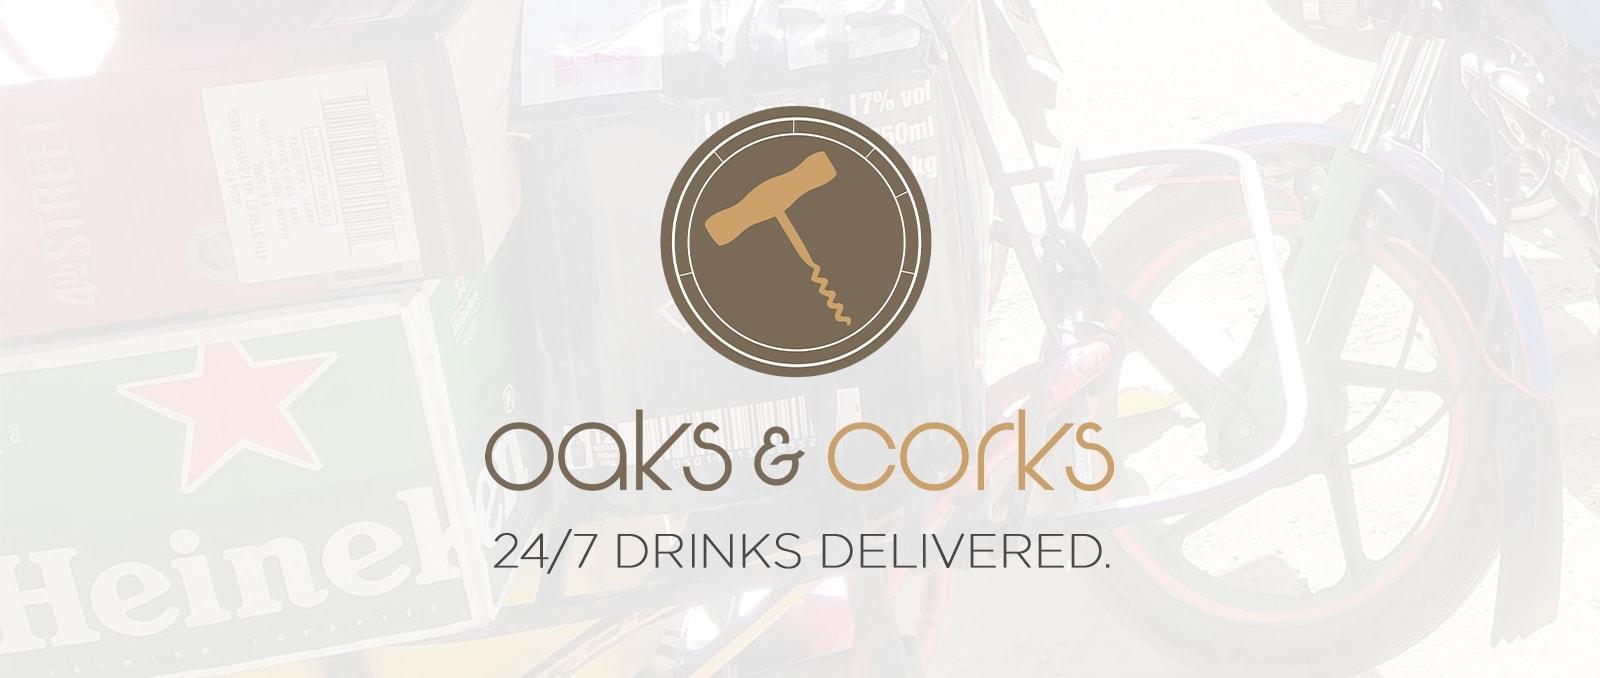 Alcohol Delivery Kenya – Story about Oaks & Corks